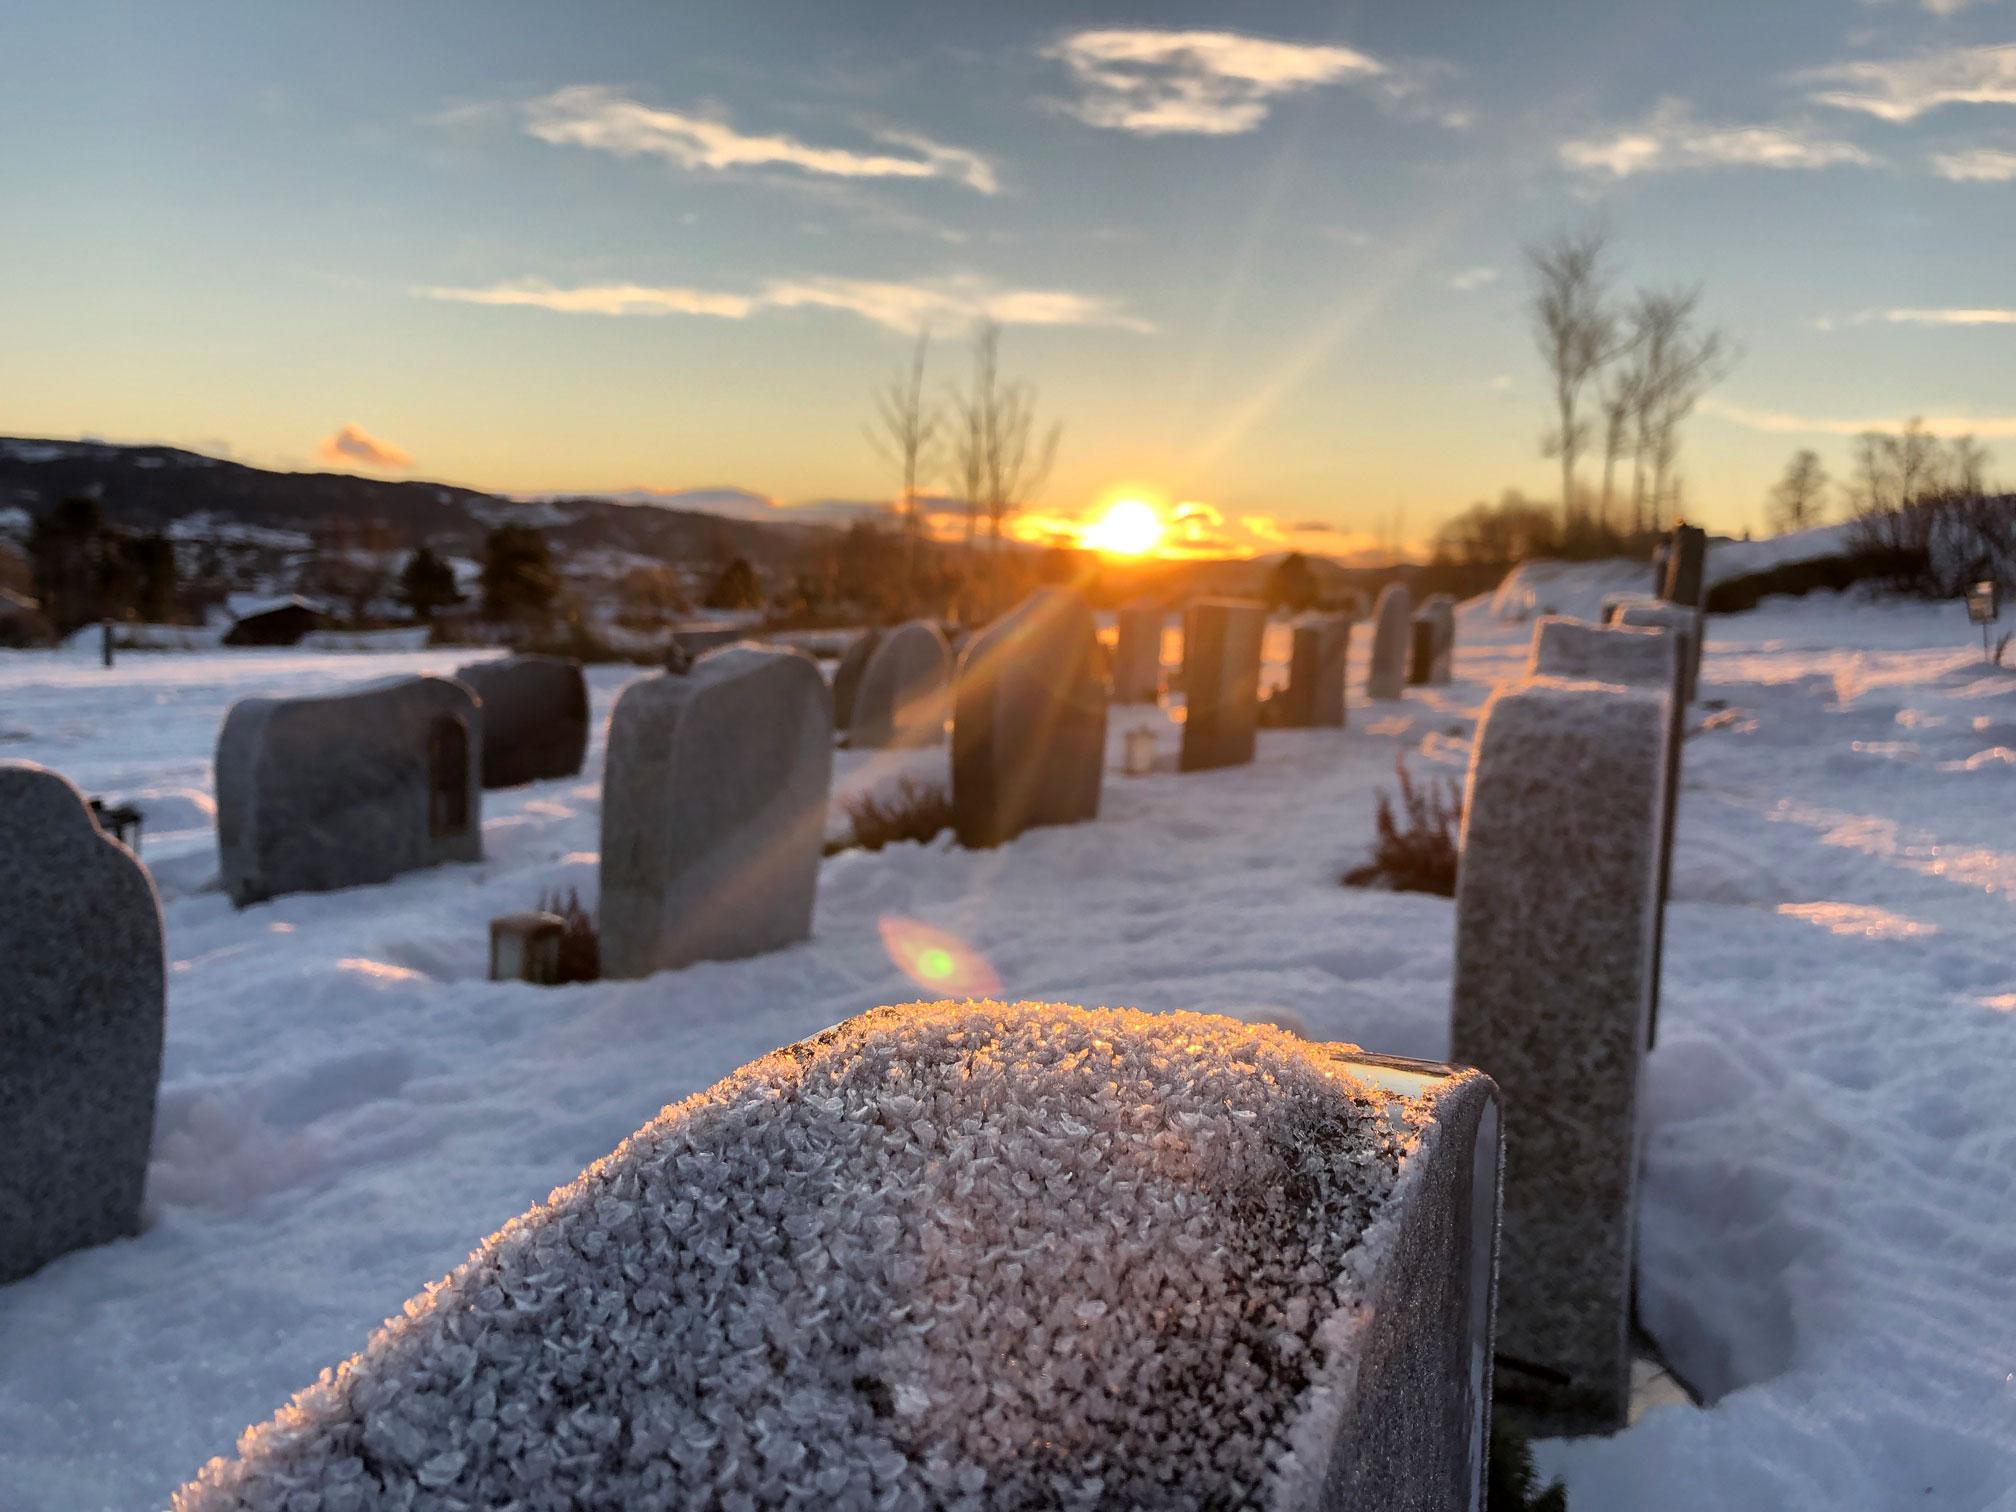 Havstein kirkegård - Gravstein Norge AS